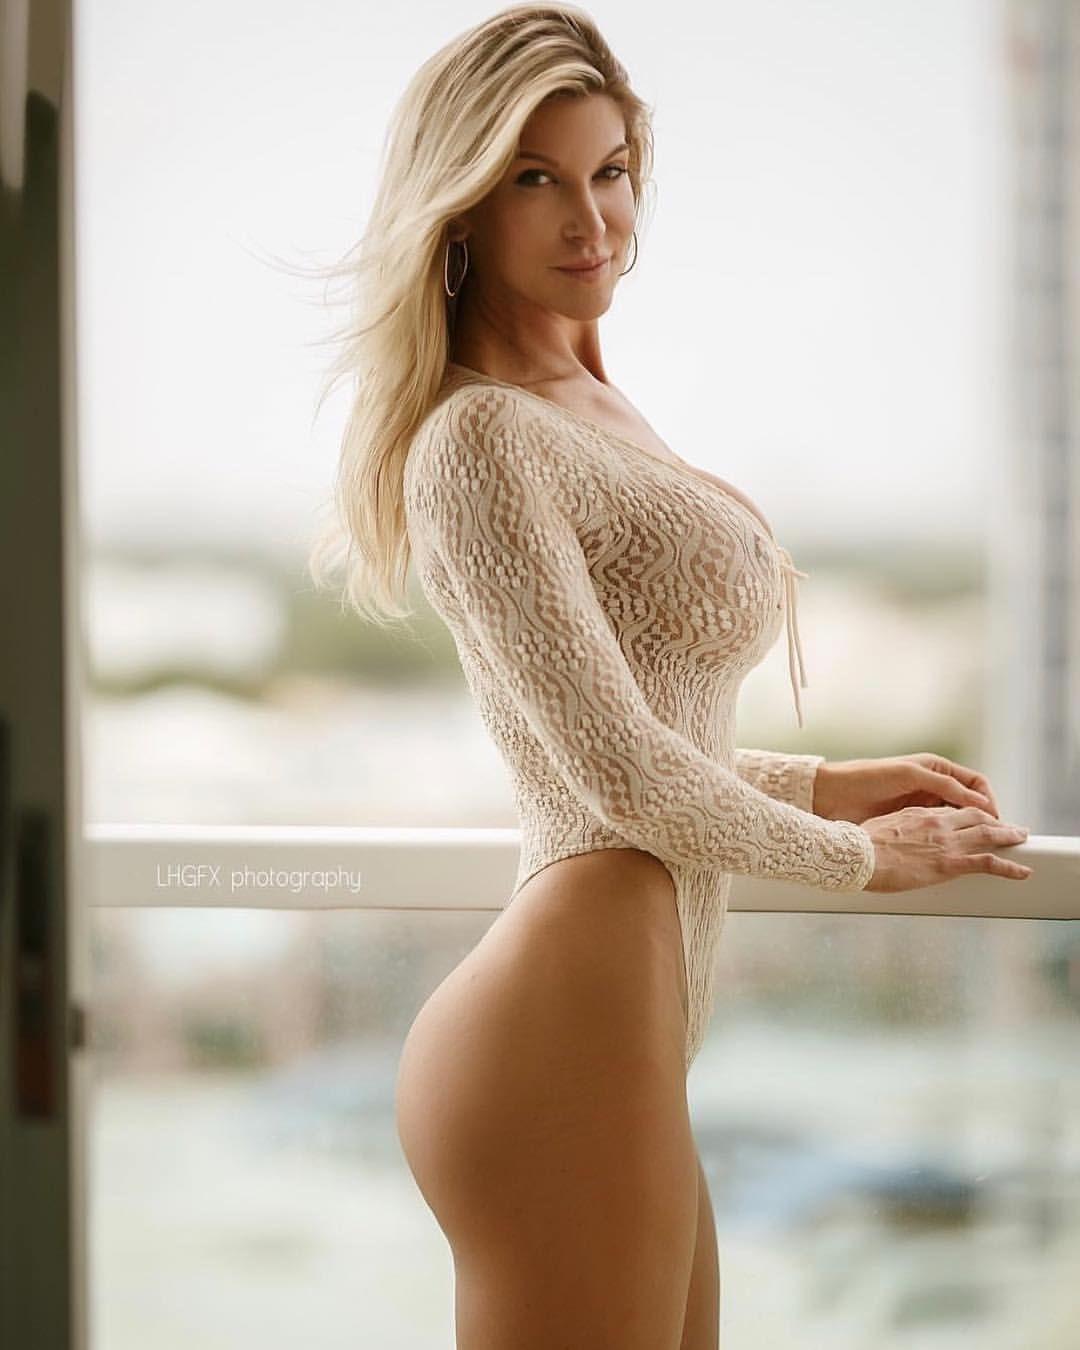 Valerie Daugherty  Model, Fashion, Girl-8611